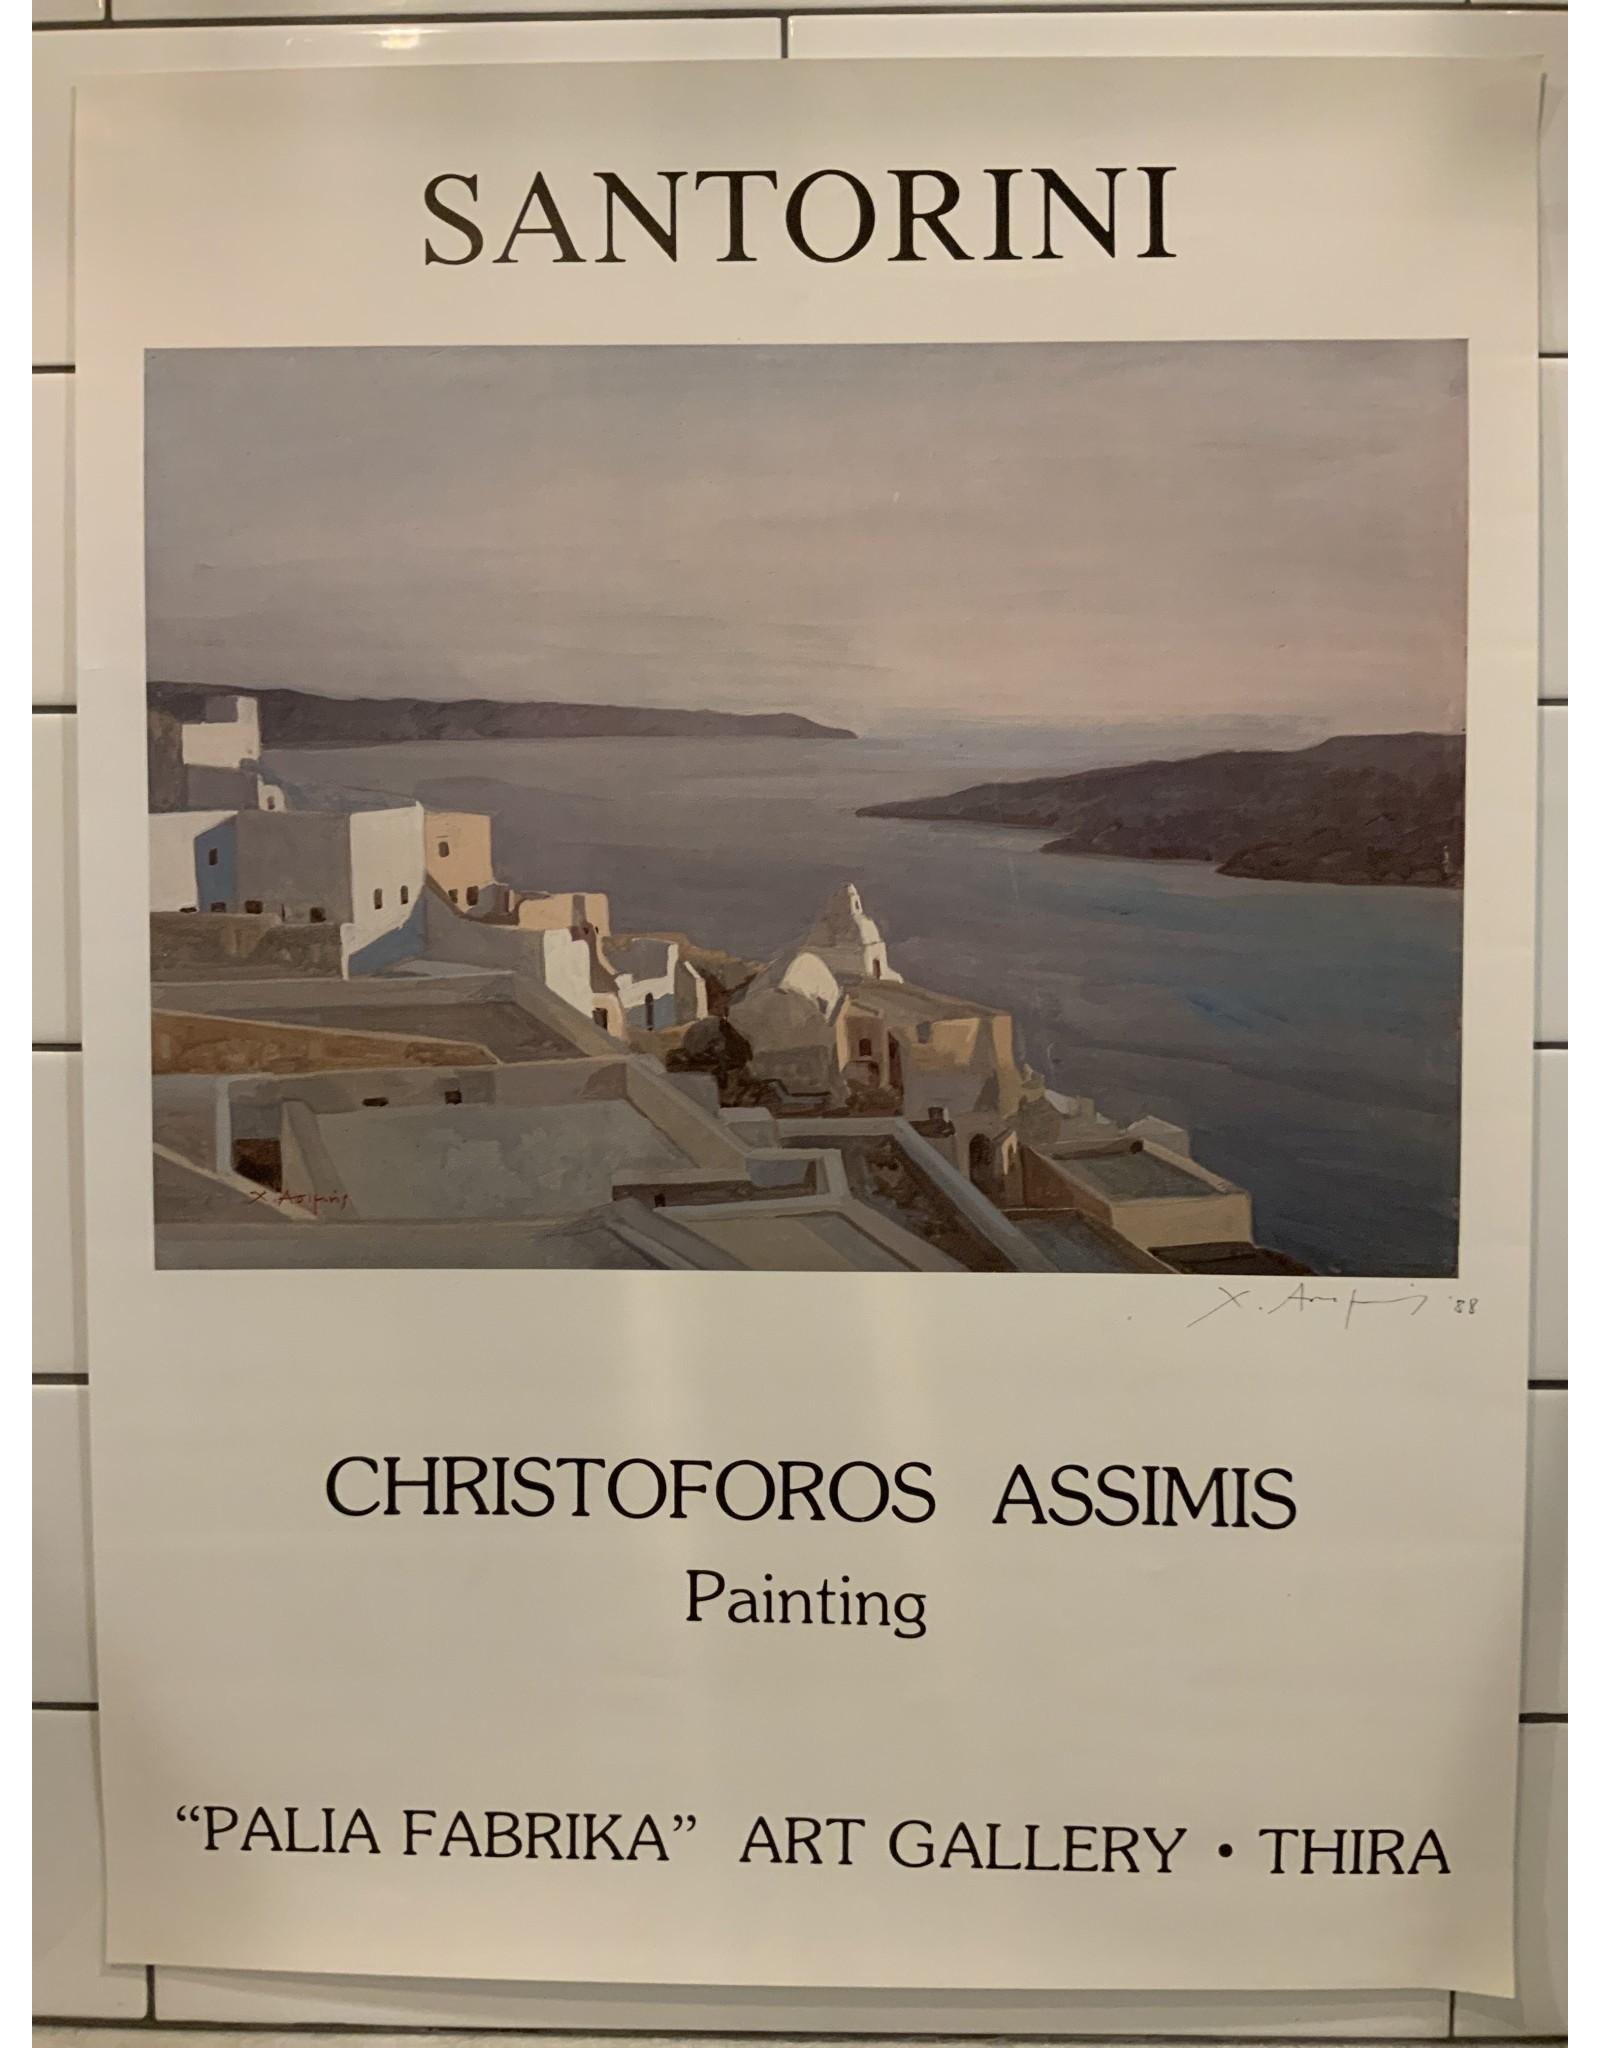 SPV Santorini Greece Poster